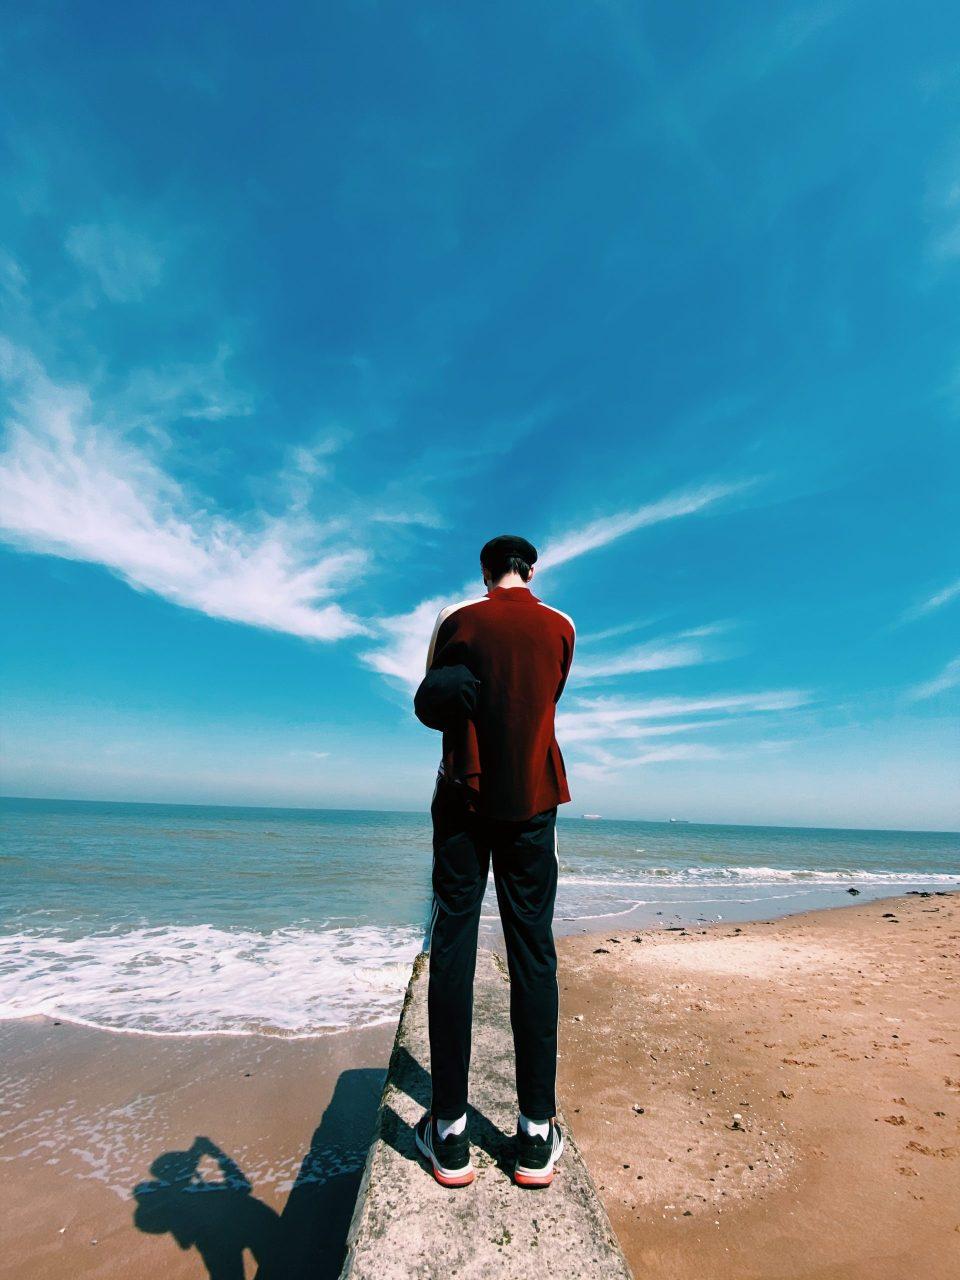 josh standing on Walpole bay beach in Margate